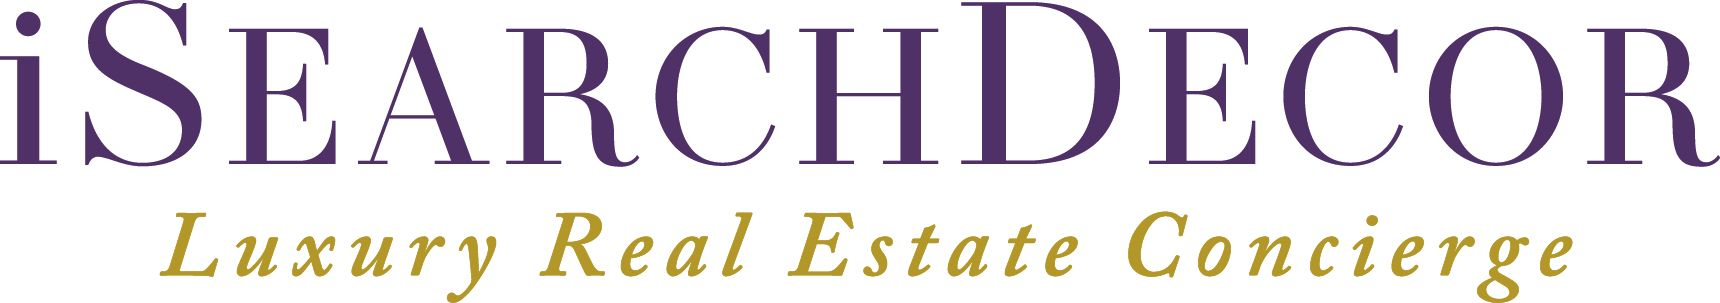 iSearchDecor, LLC Logo